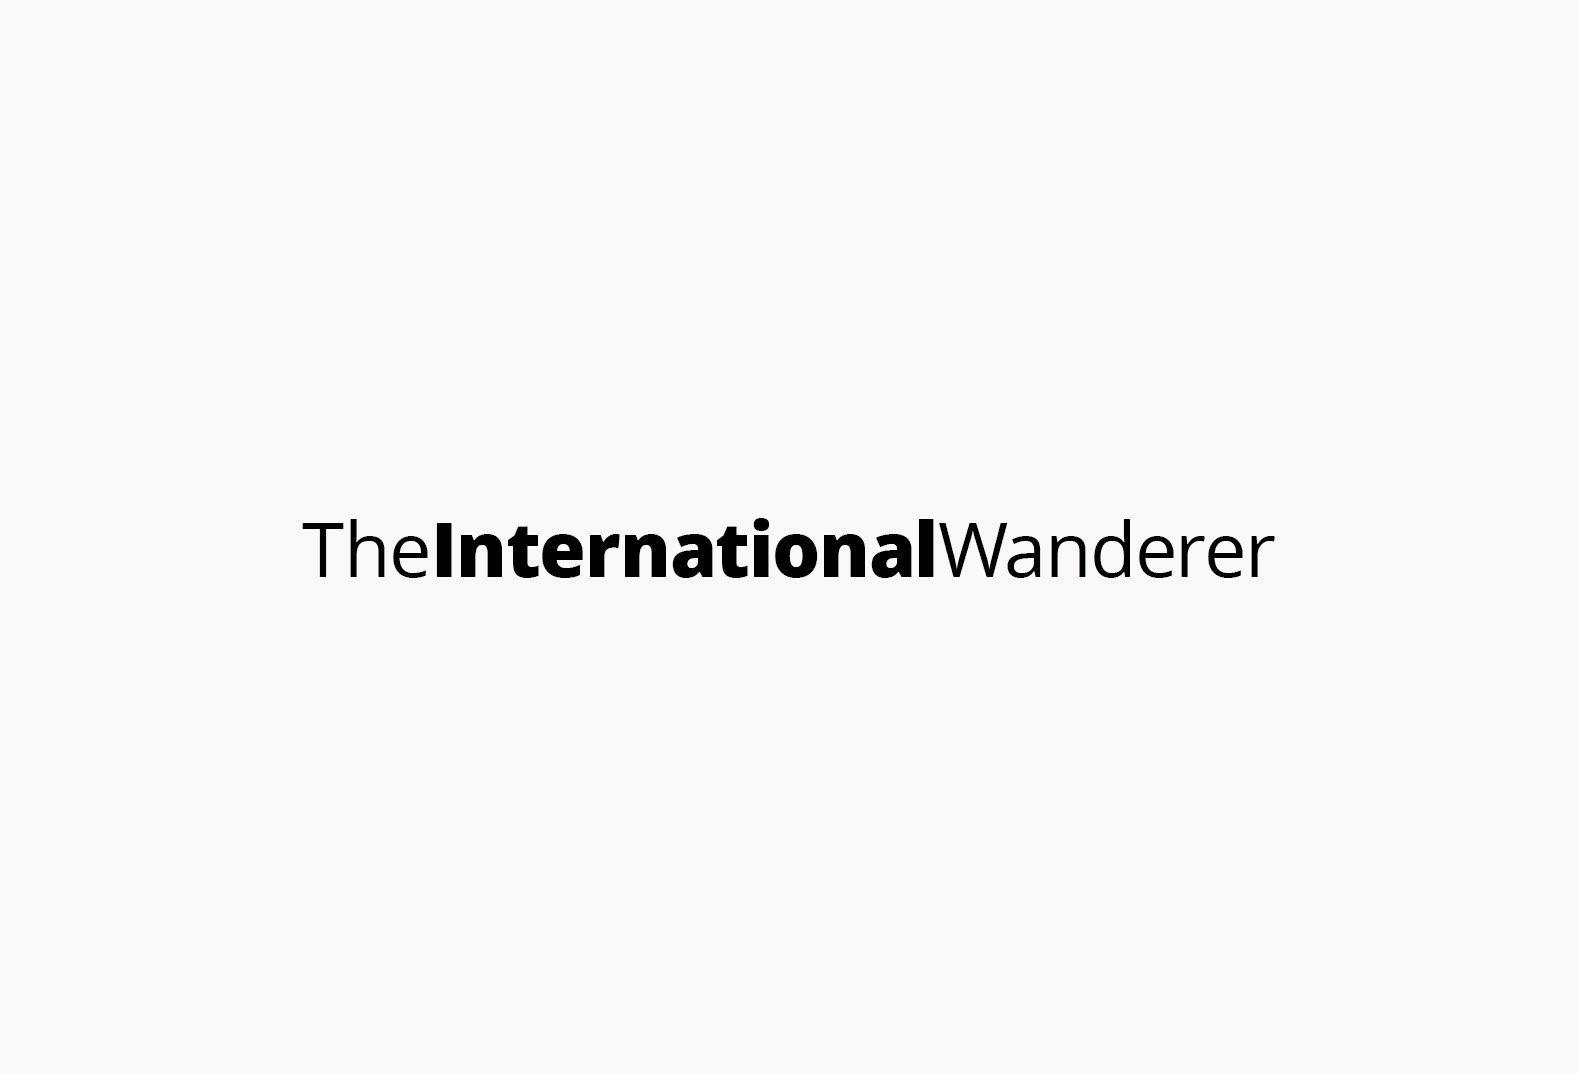 The International Wanderer Logo